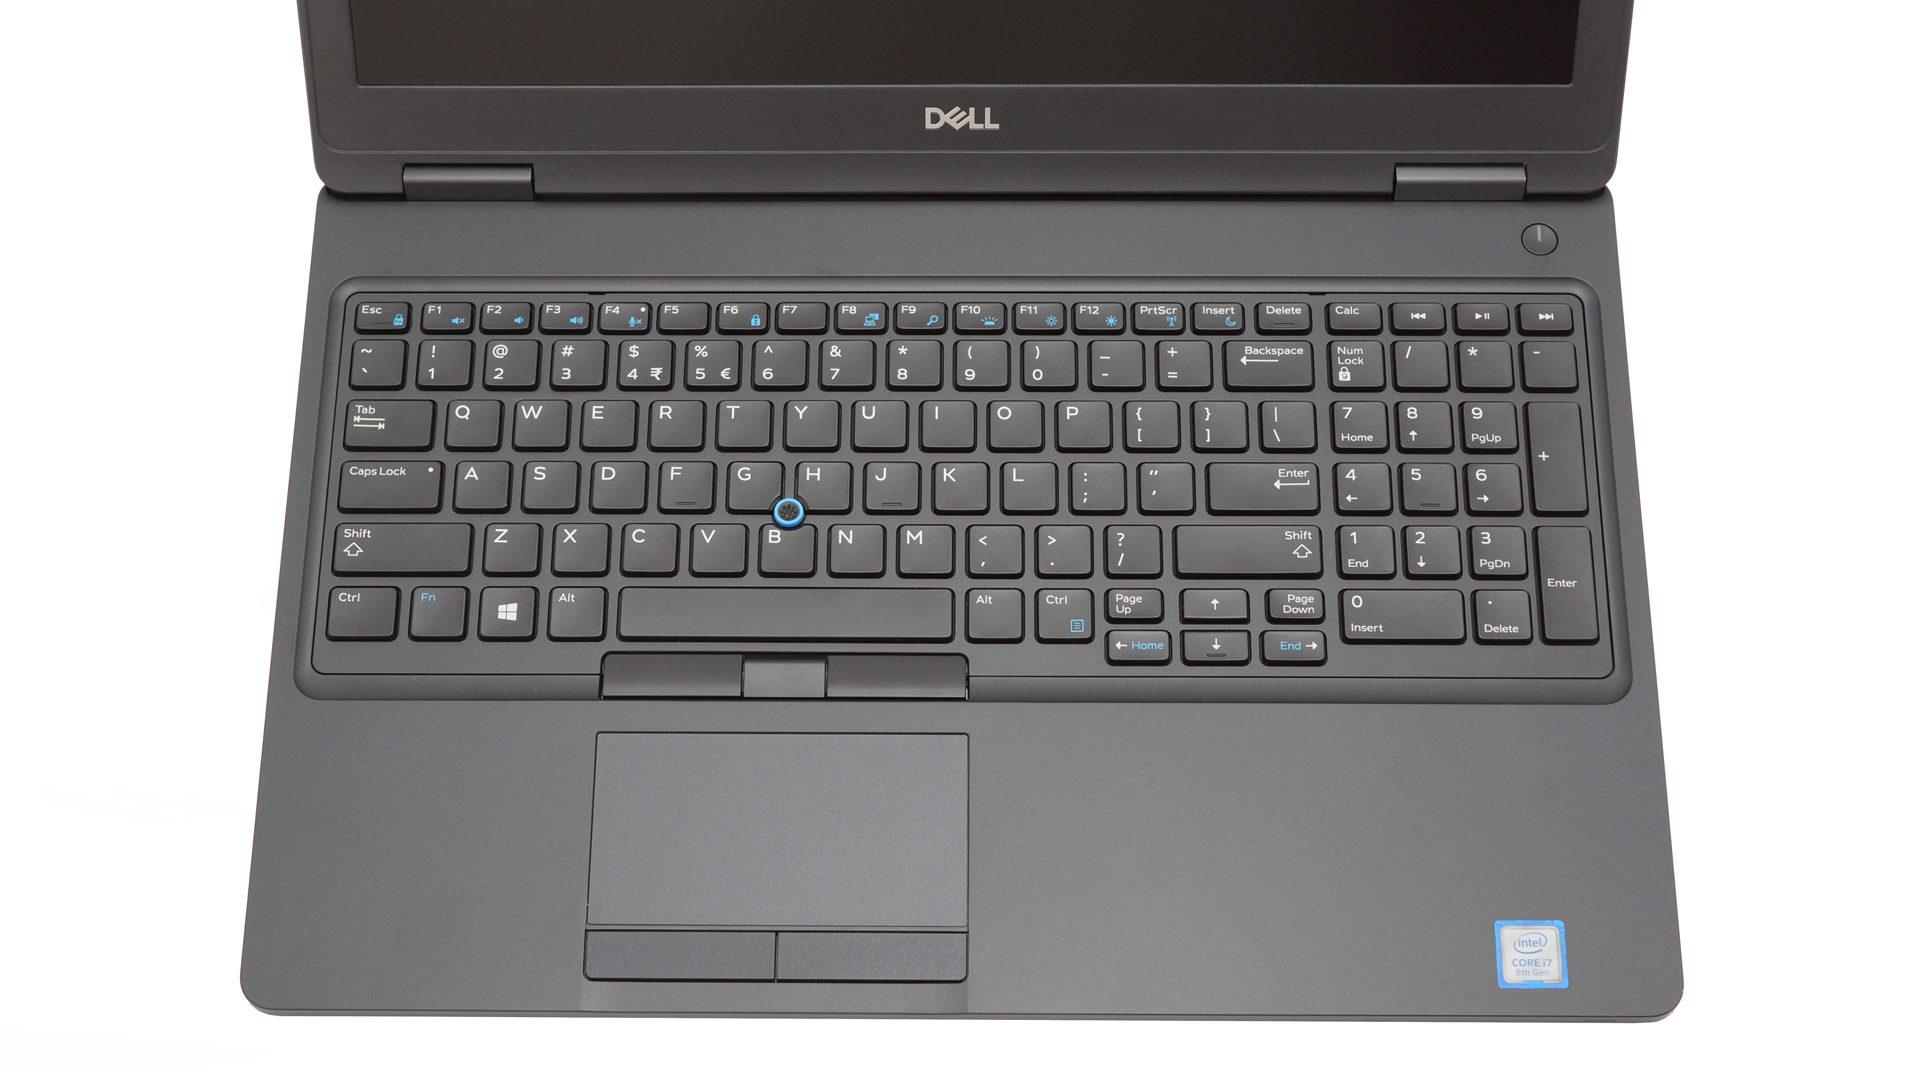 521d3e88b73 Dell Latitude 15 5590 review – the new Core i7-8650U in a business ...